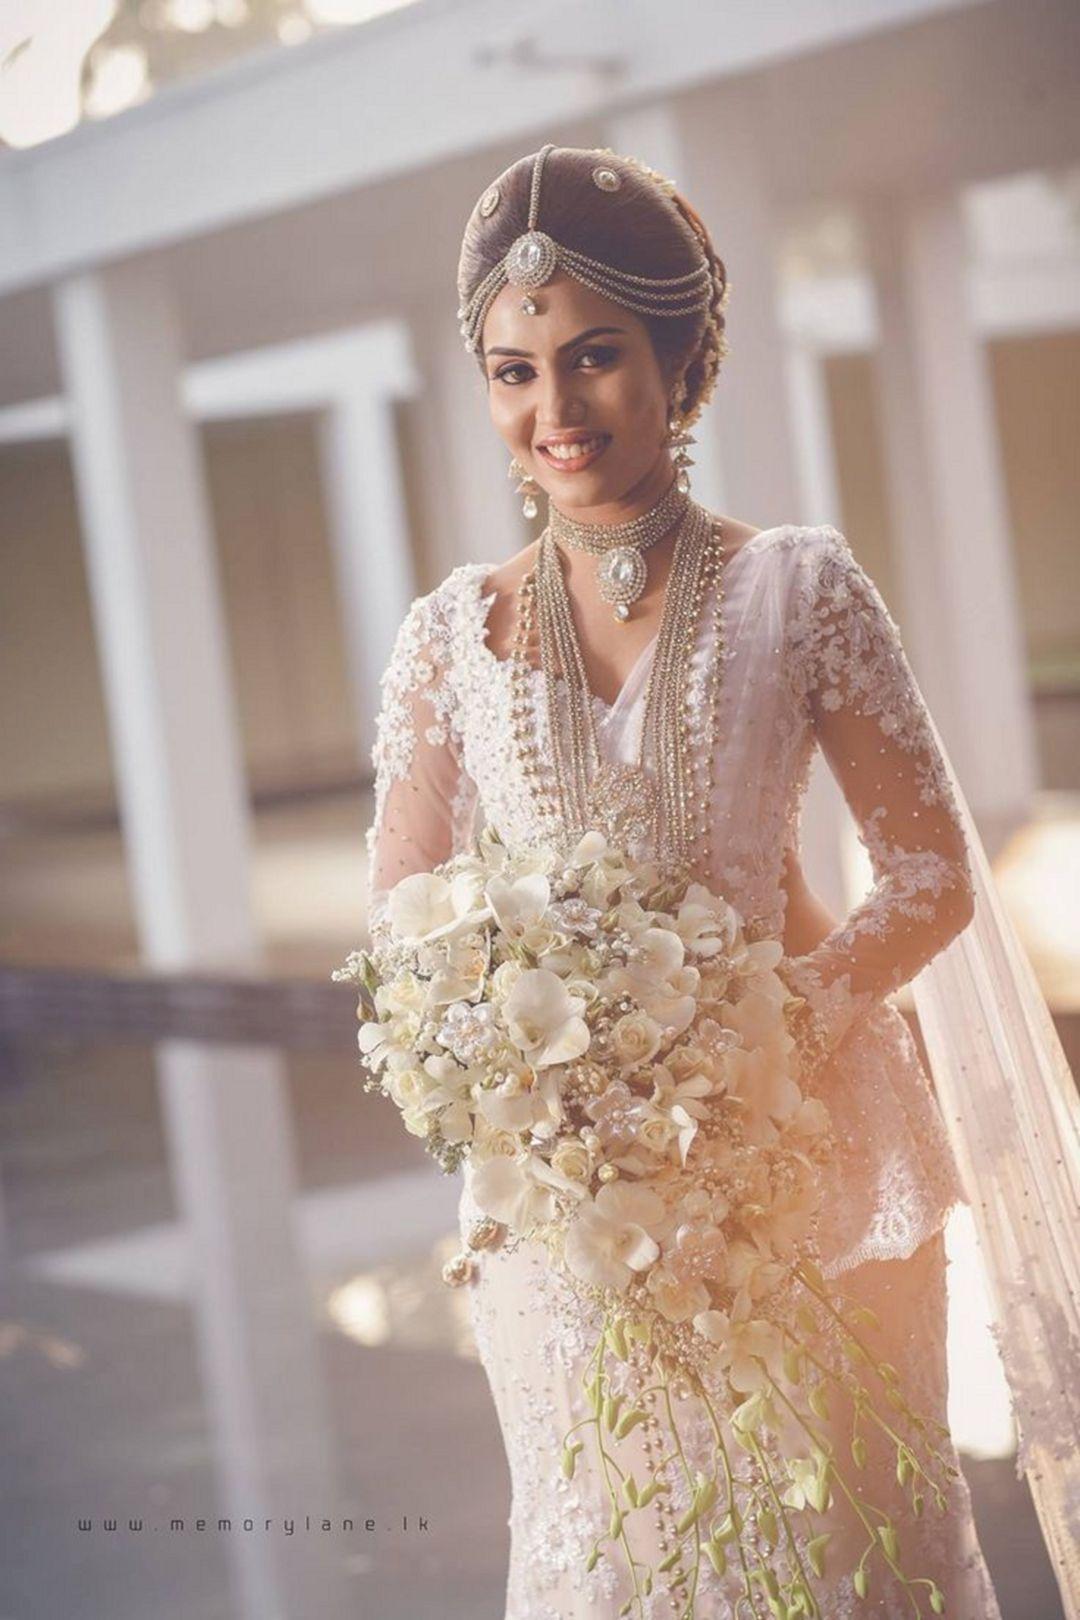 10 Awesome Wedding Dress Collection For Winter Wedding Ideas Christian Bridal Saree White Saree Wedding Bridal Wedding Dresses